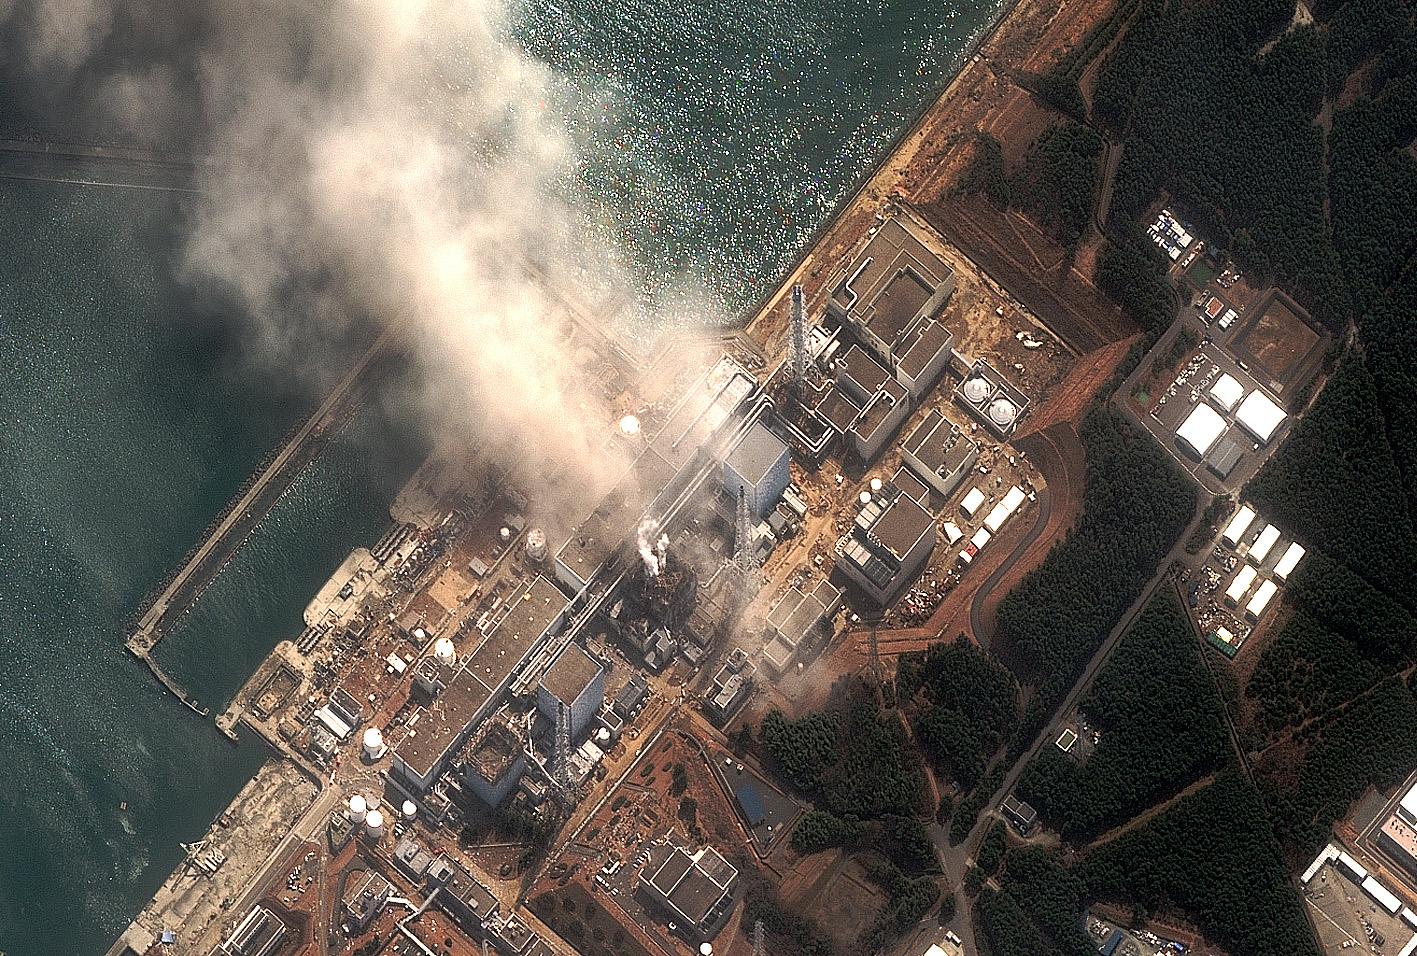 Nueva fuga de agua radiactiva en la central nuclear de Fukushima